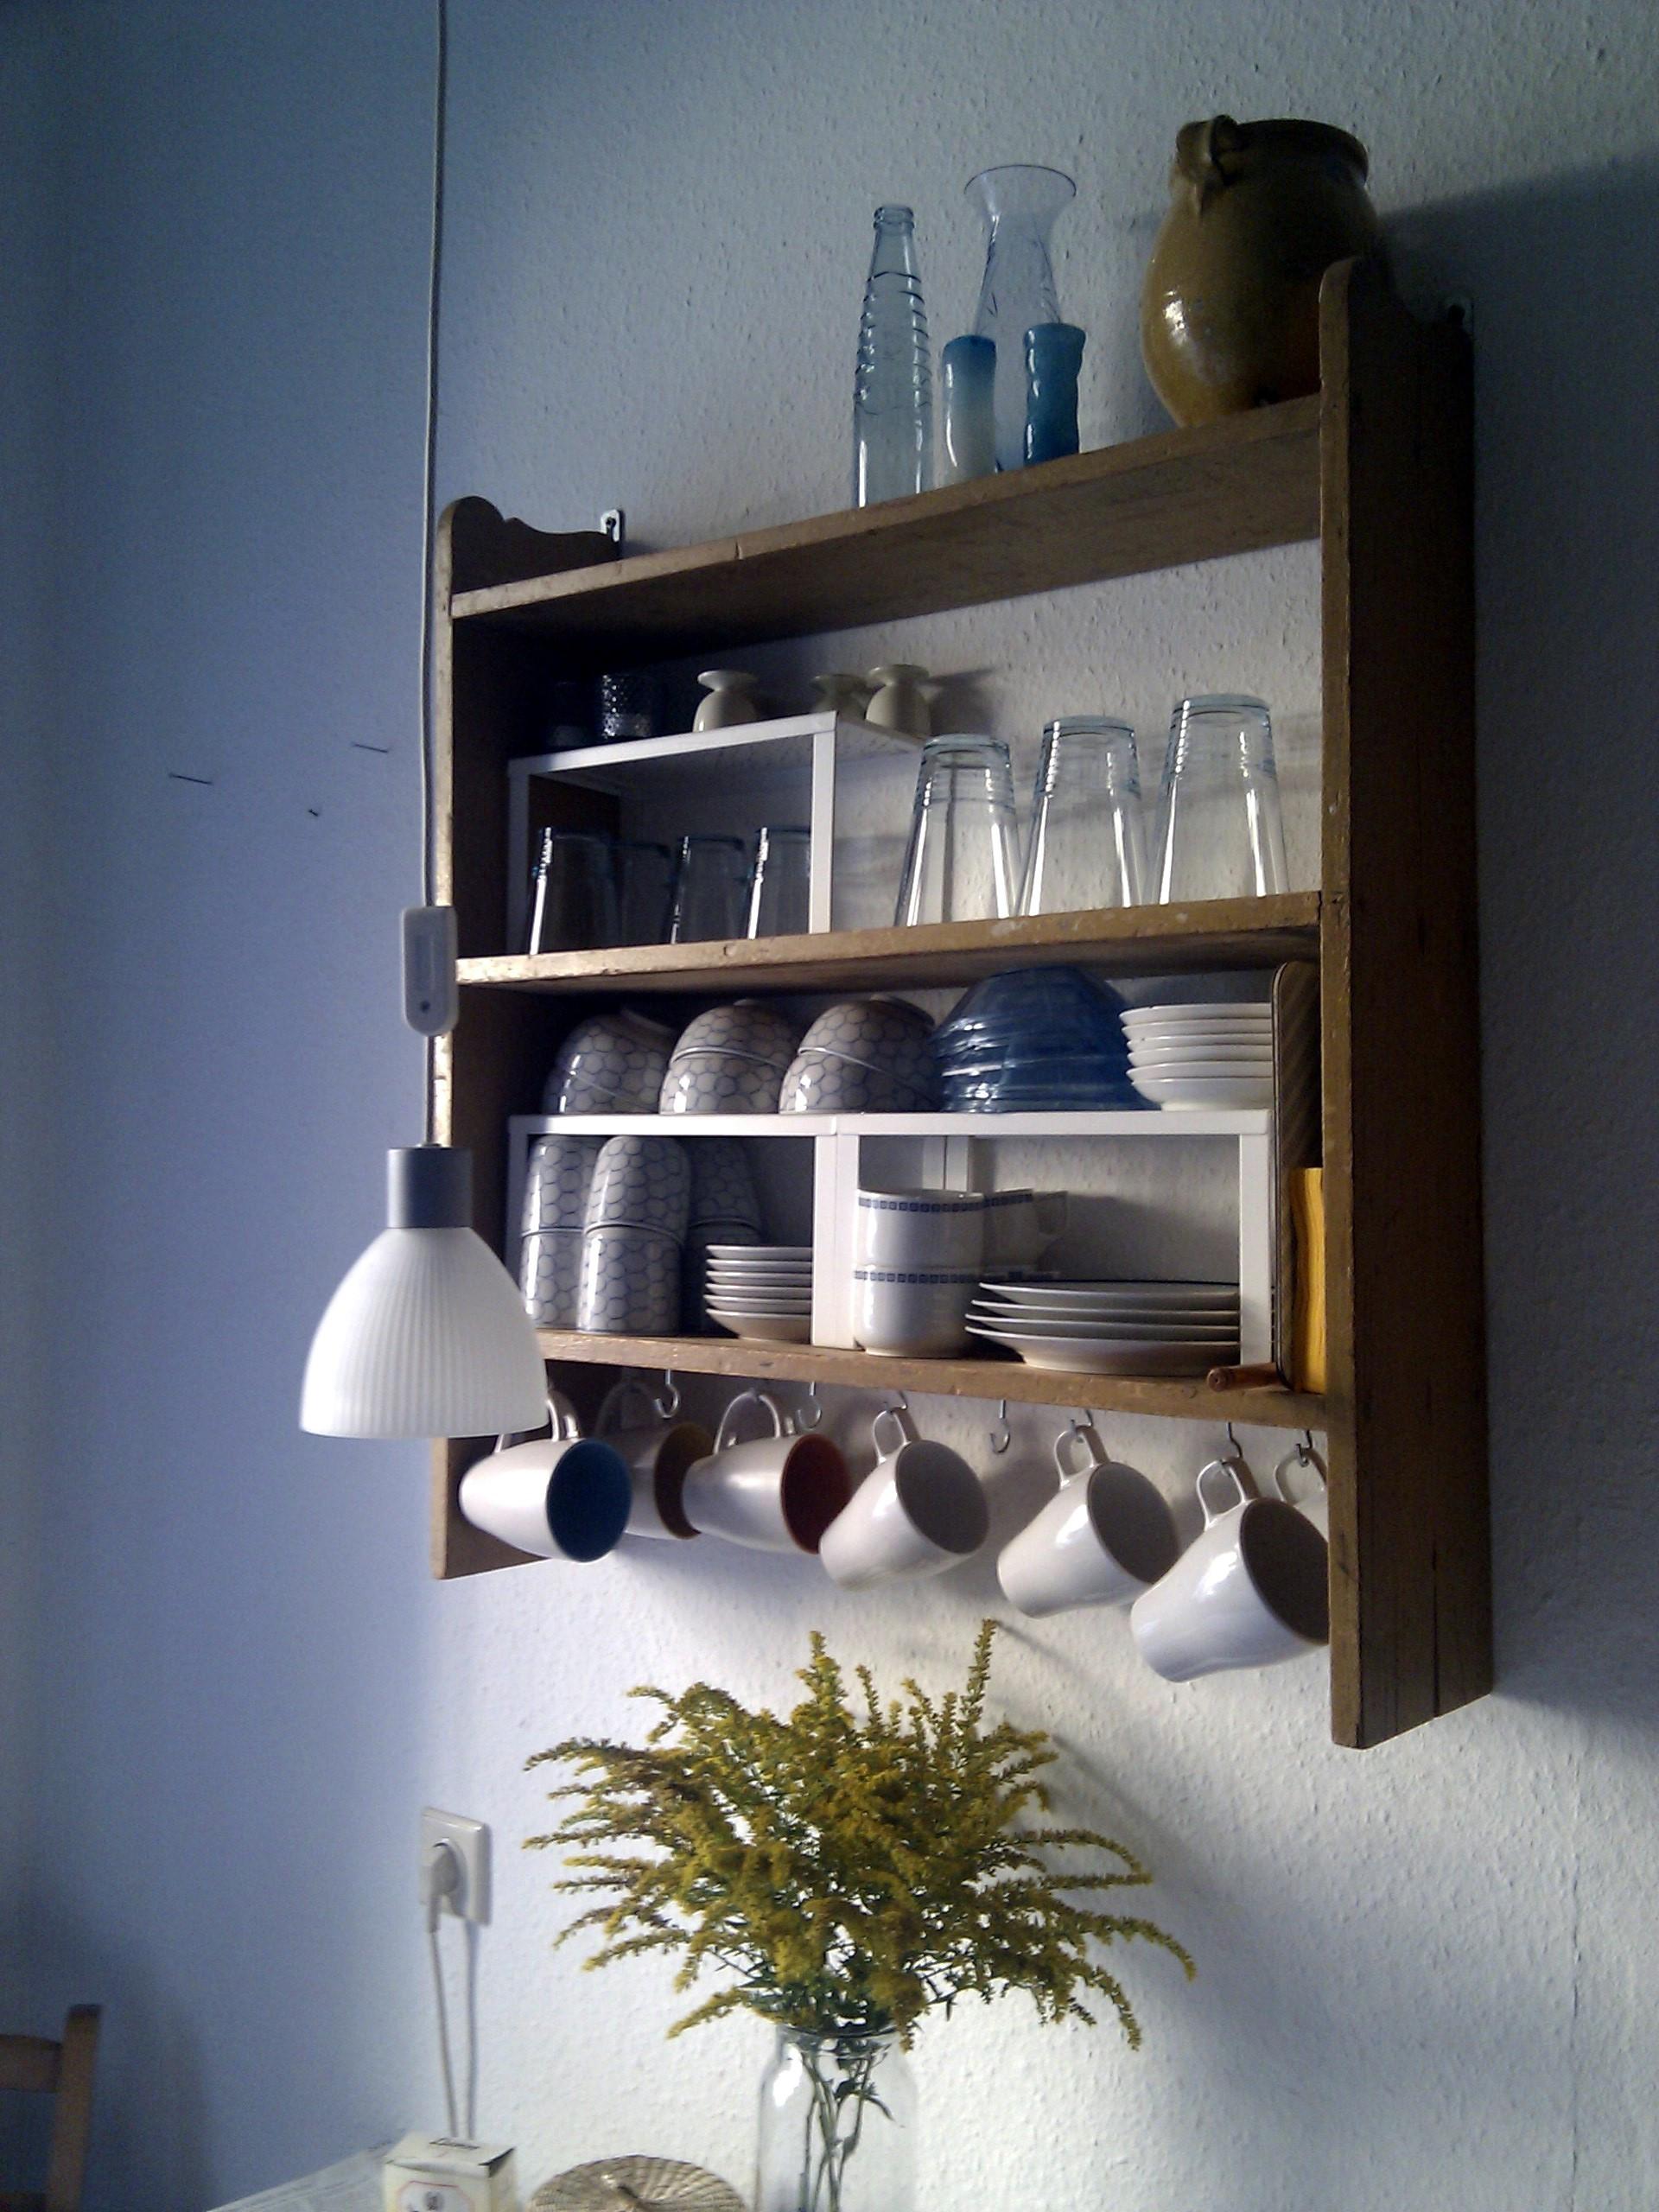 Ikea Küchenregal  Ikea Küche Hack